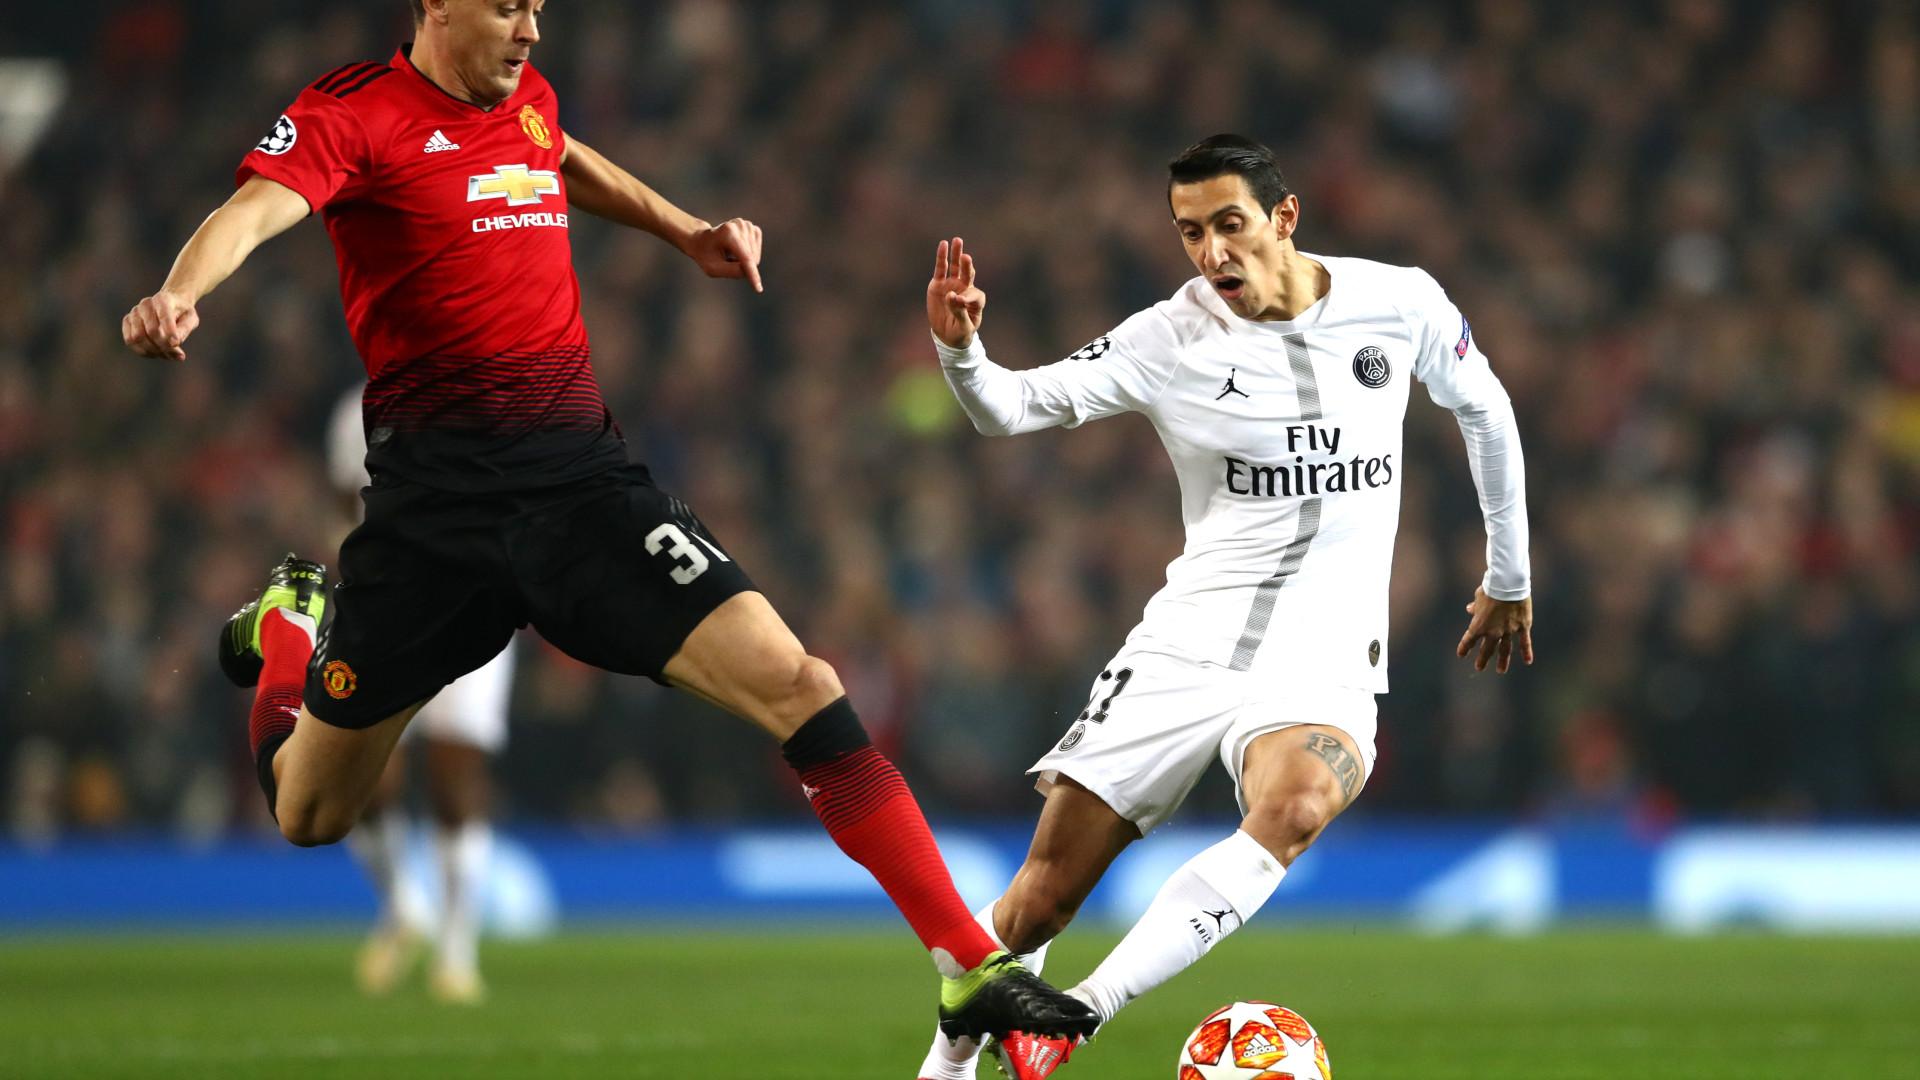 UEFA abre processos disciplinares a Manchester United e PSG